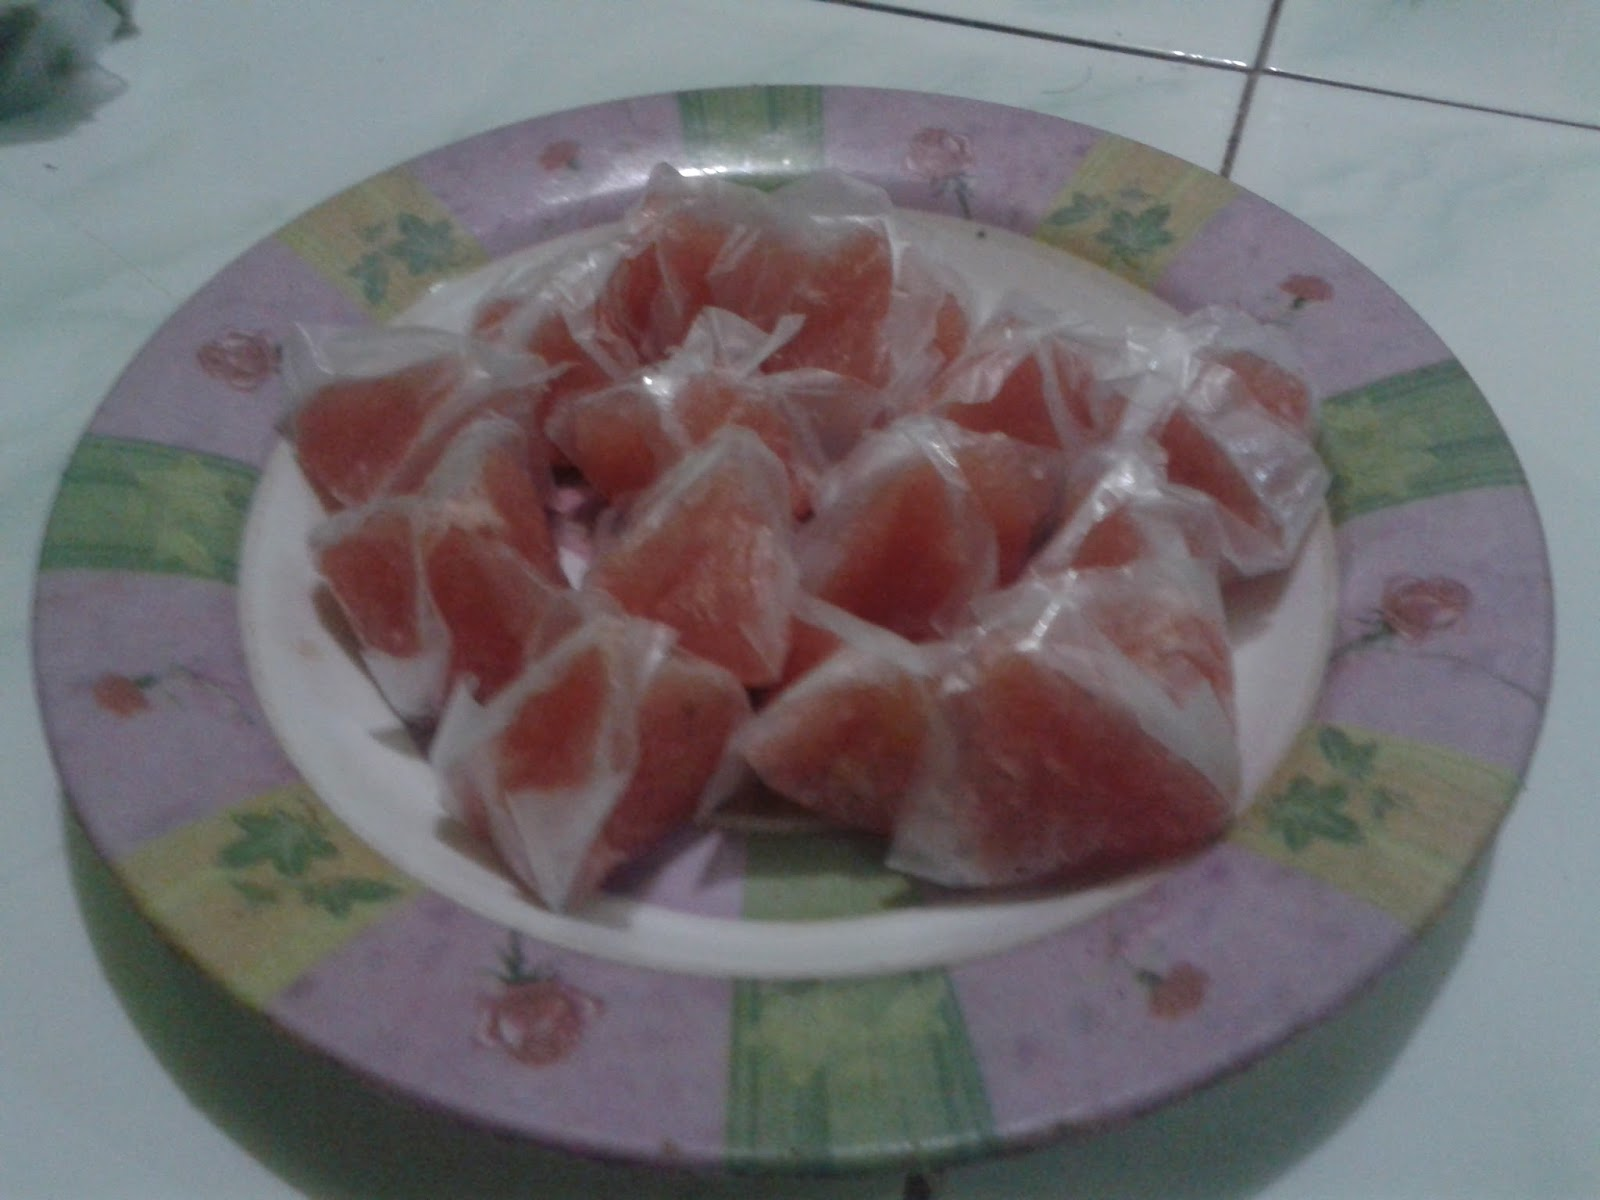 Resep Kue Resep Cara Membuat Wajik Bandung Aneka Resep Masakan